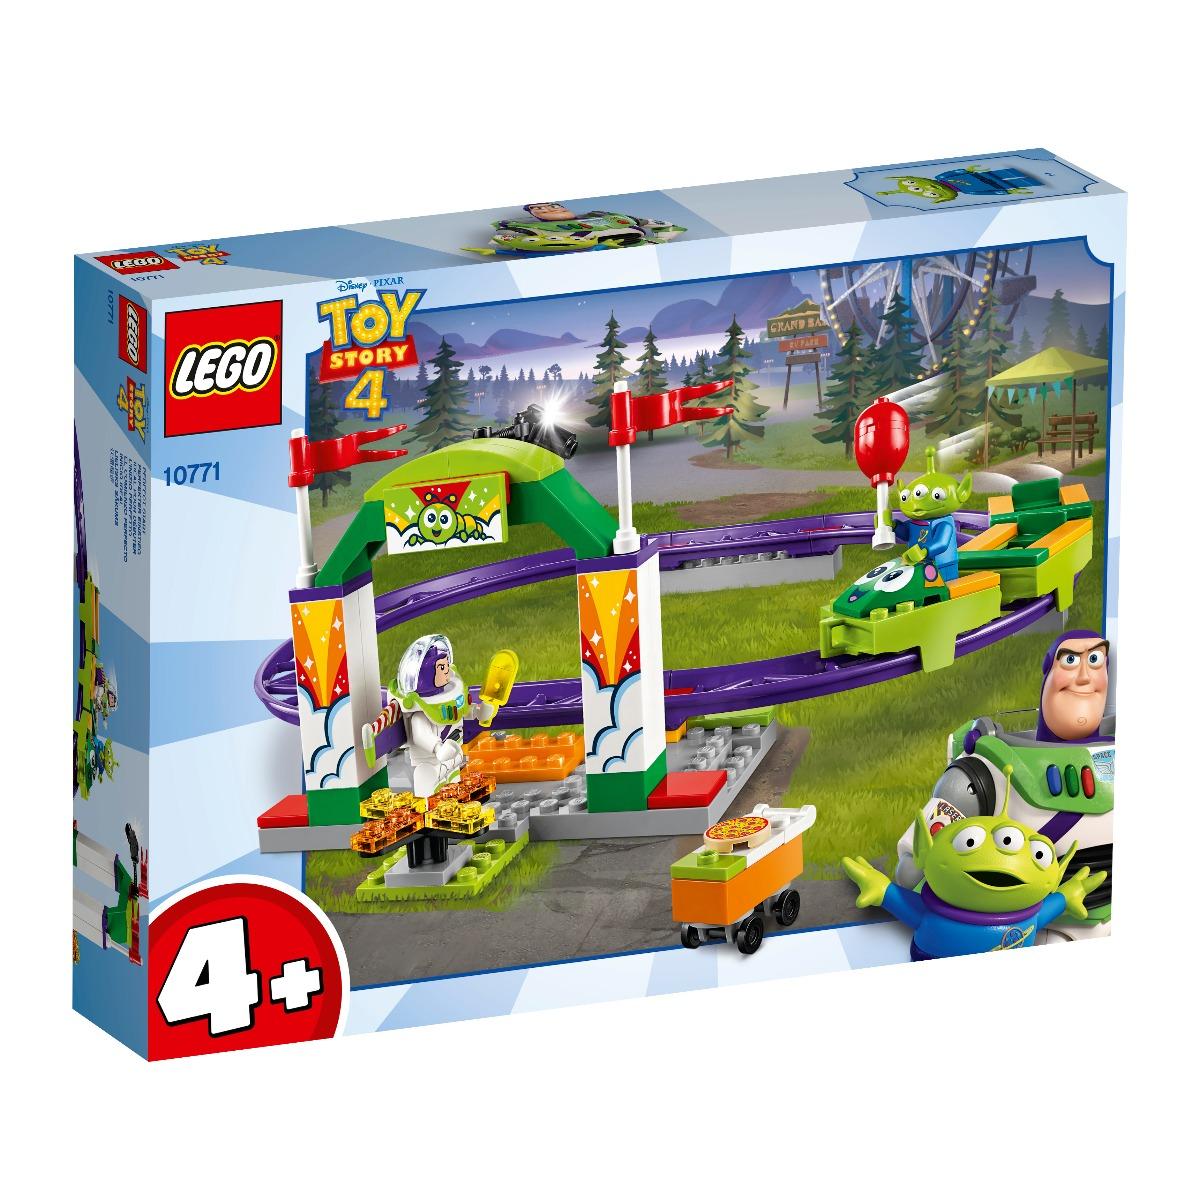 LEGO® Disney Pixar Toy Story 4 - Senzatii tari la carnaval cu montagne russe (10771)